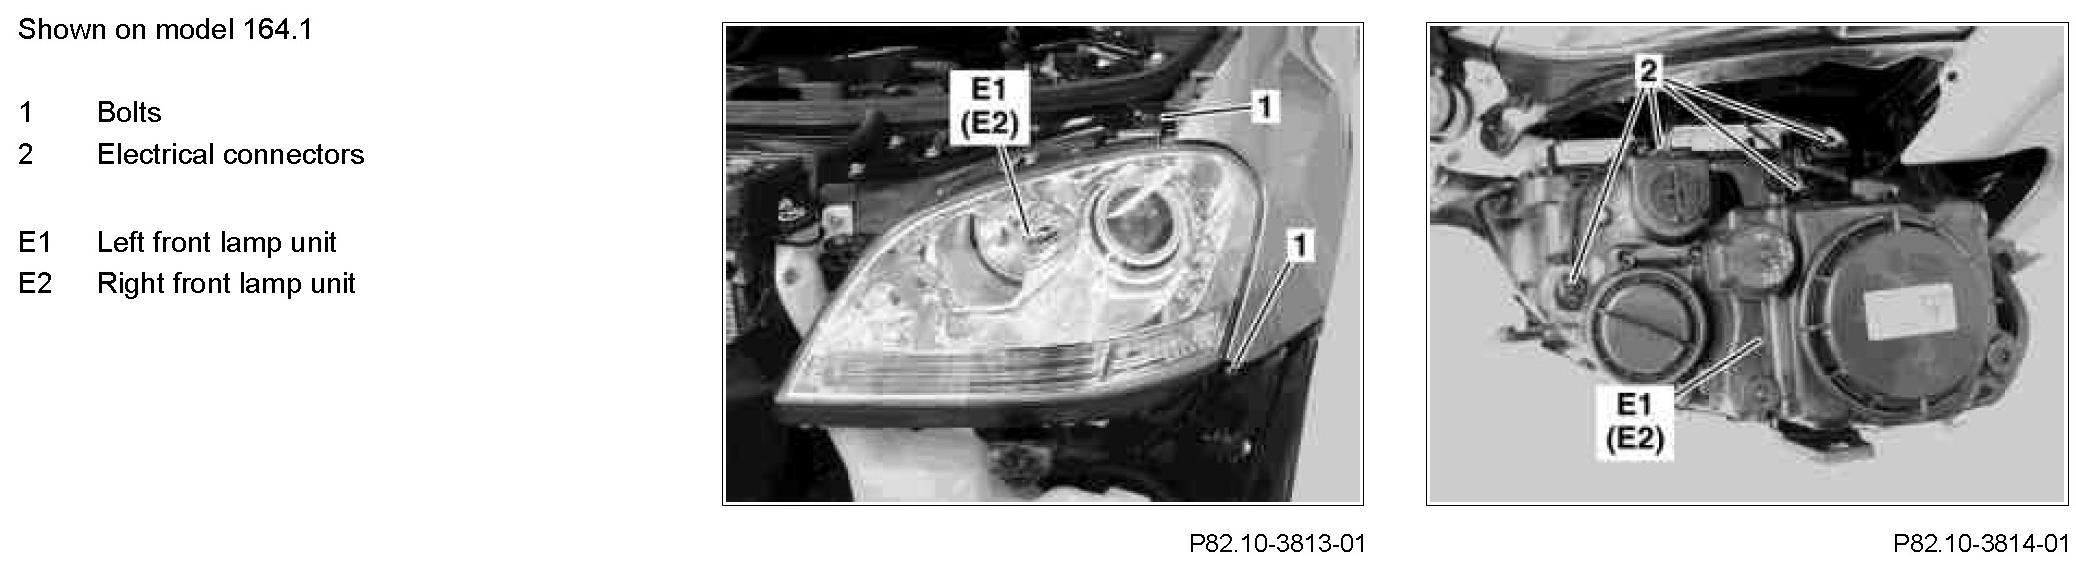 how to change headlight bulb ml500